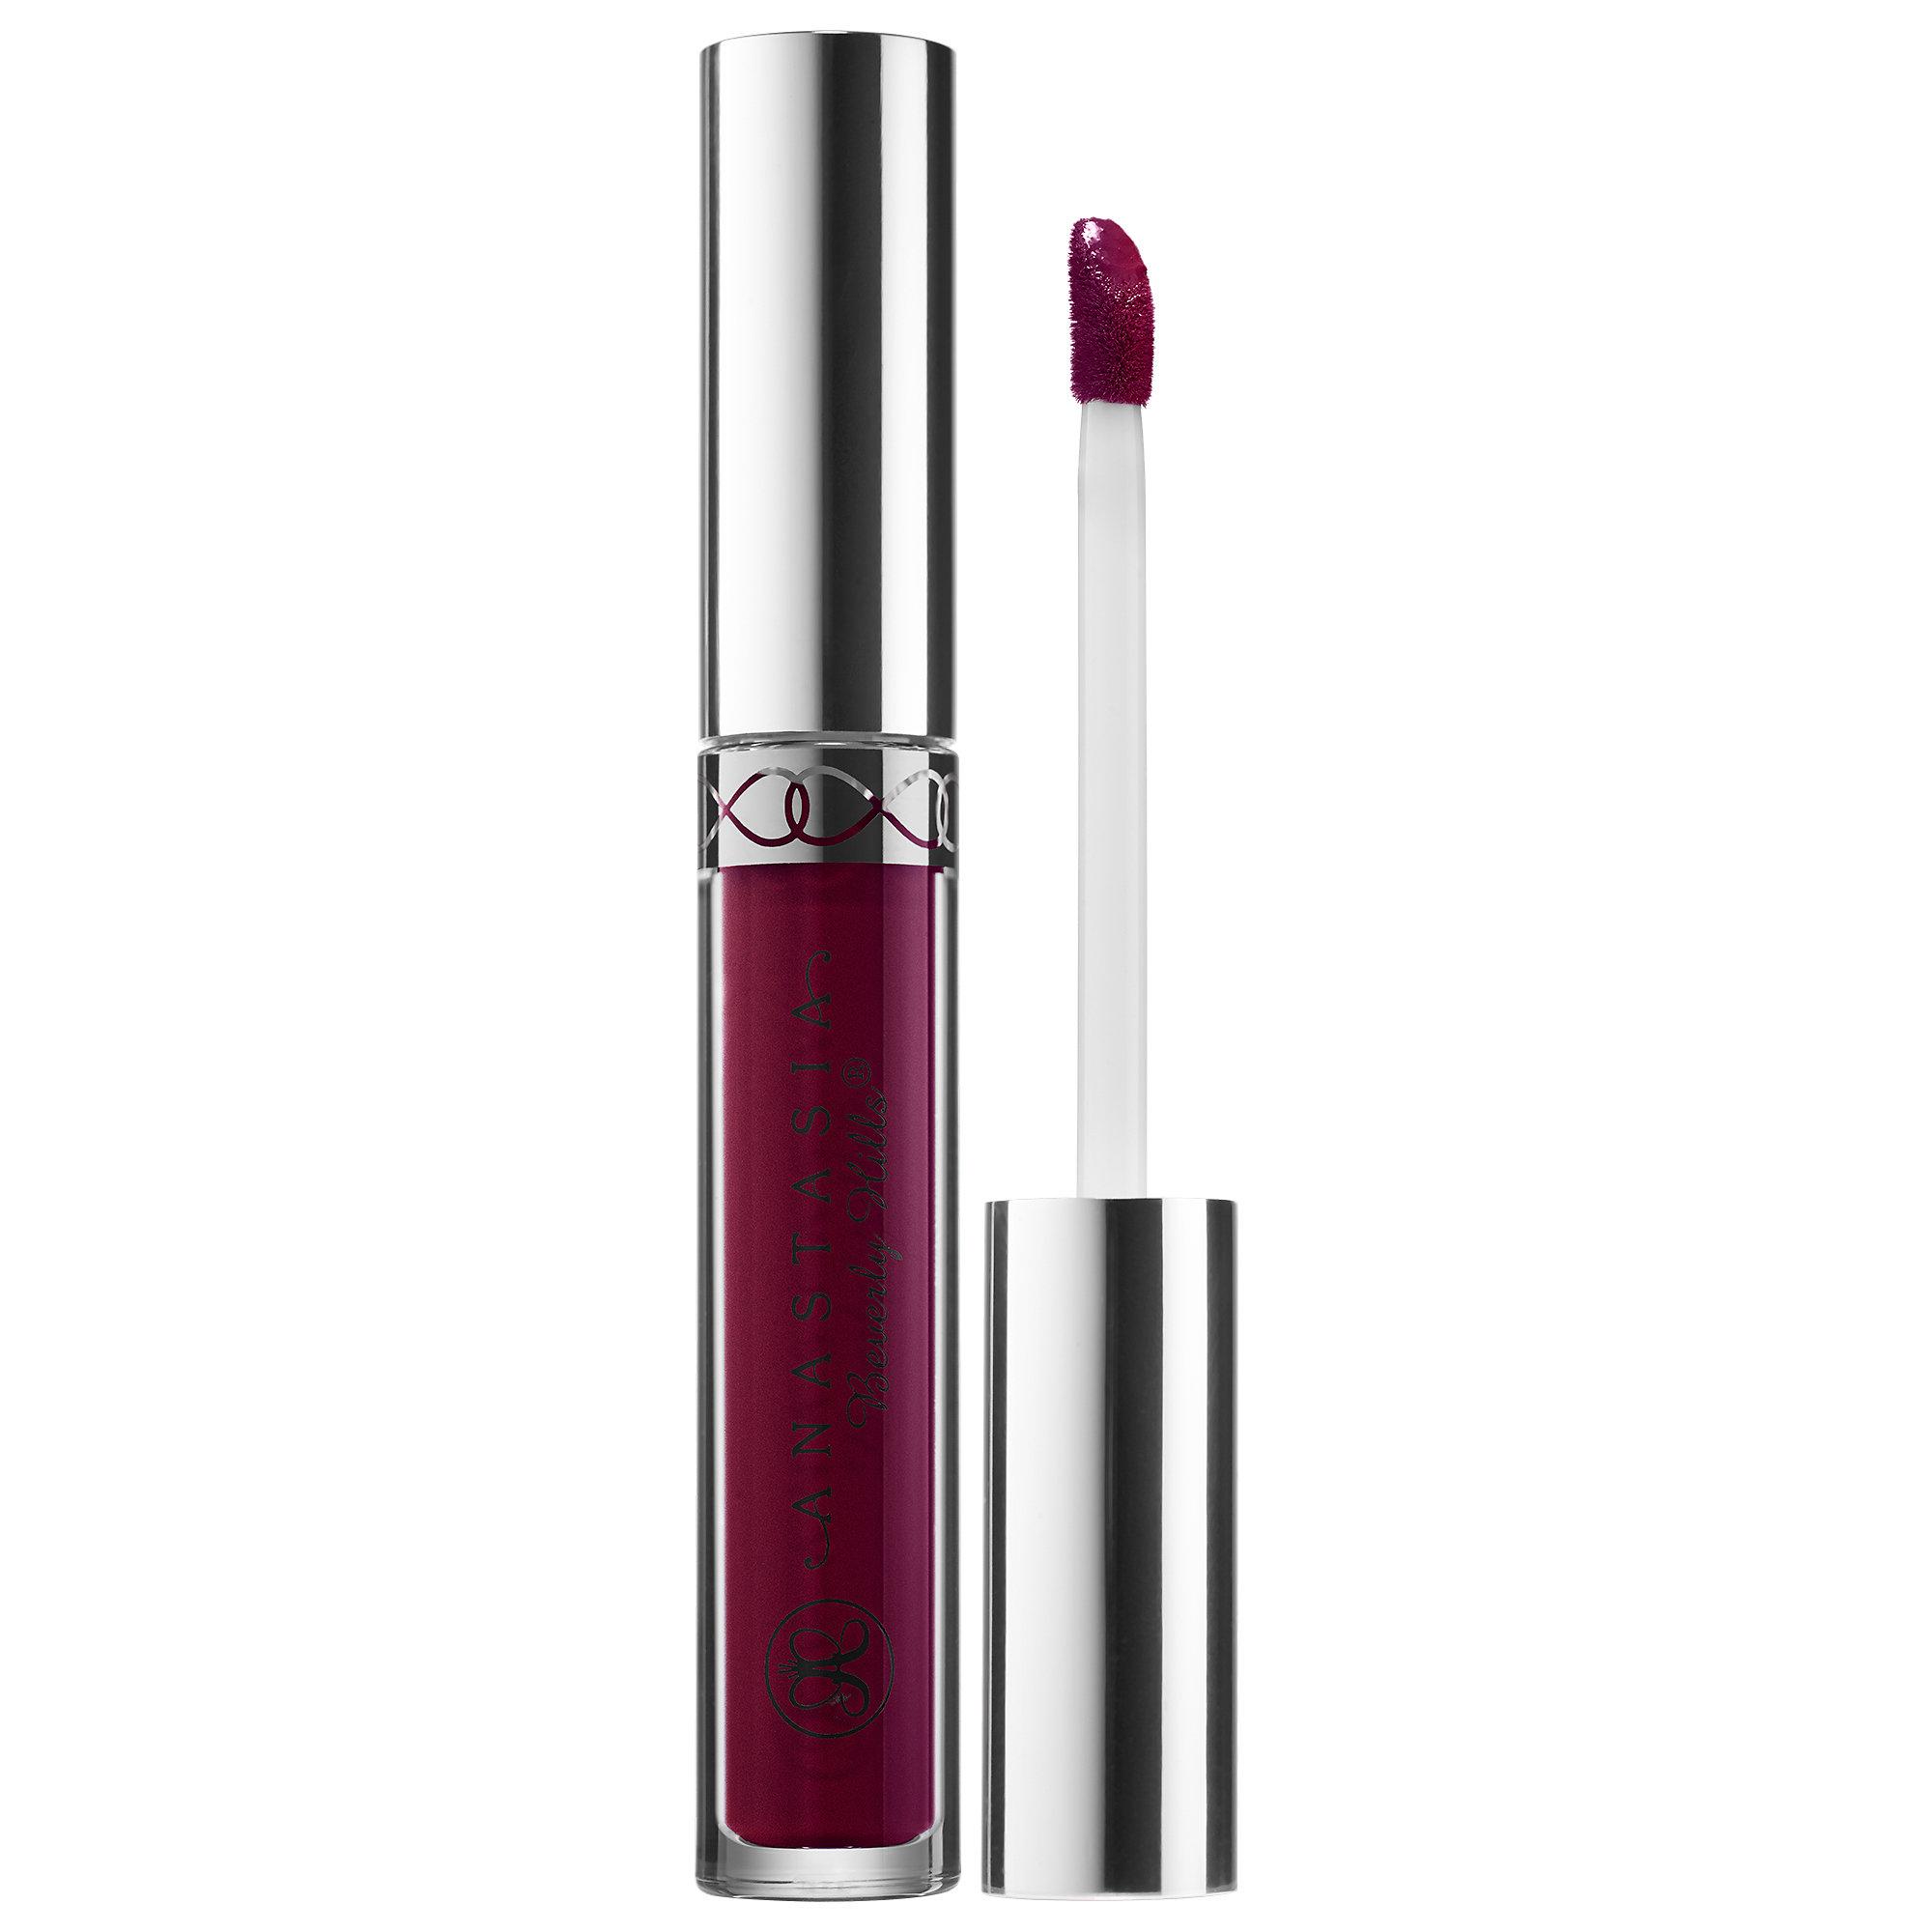 Anastasia Sad Girl Liquid Lipstick